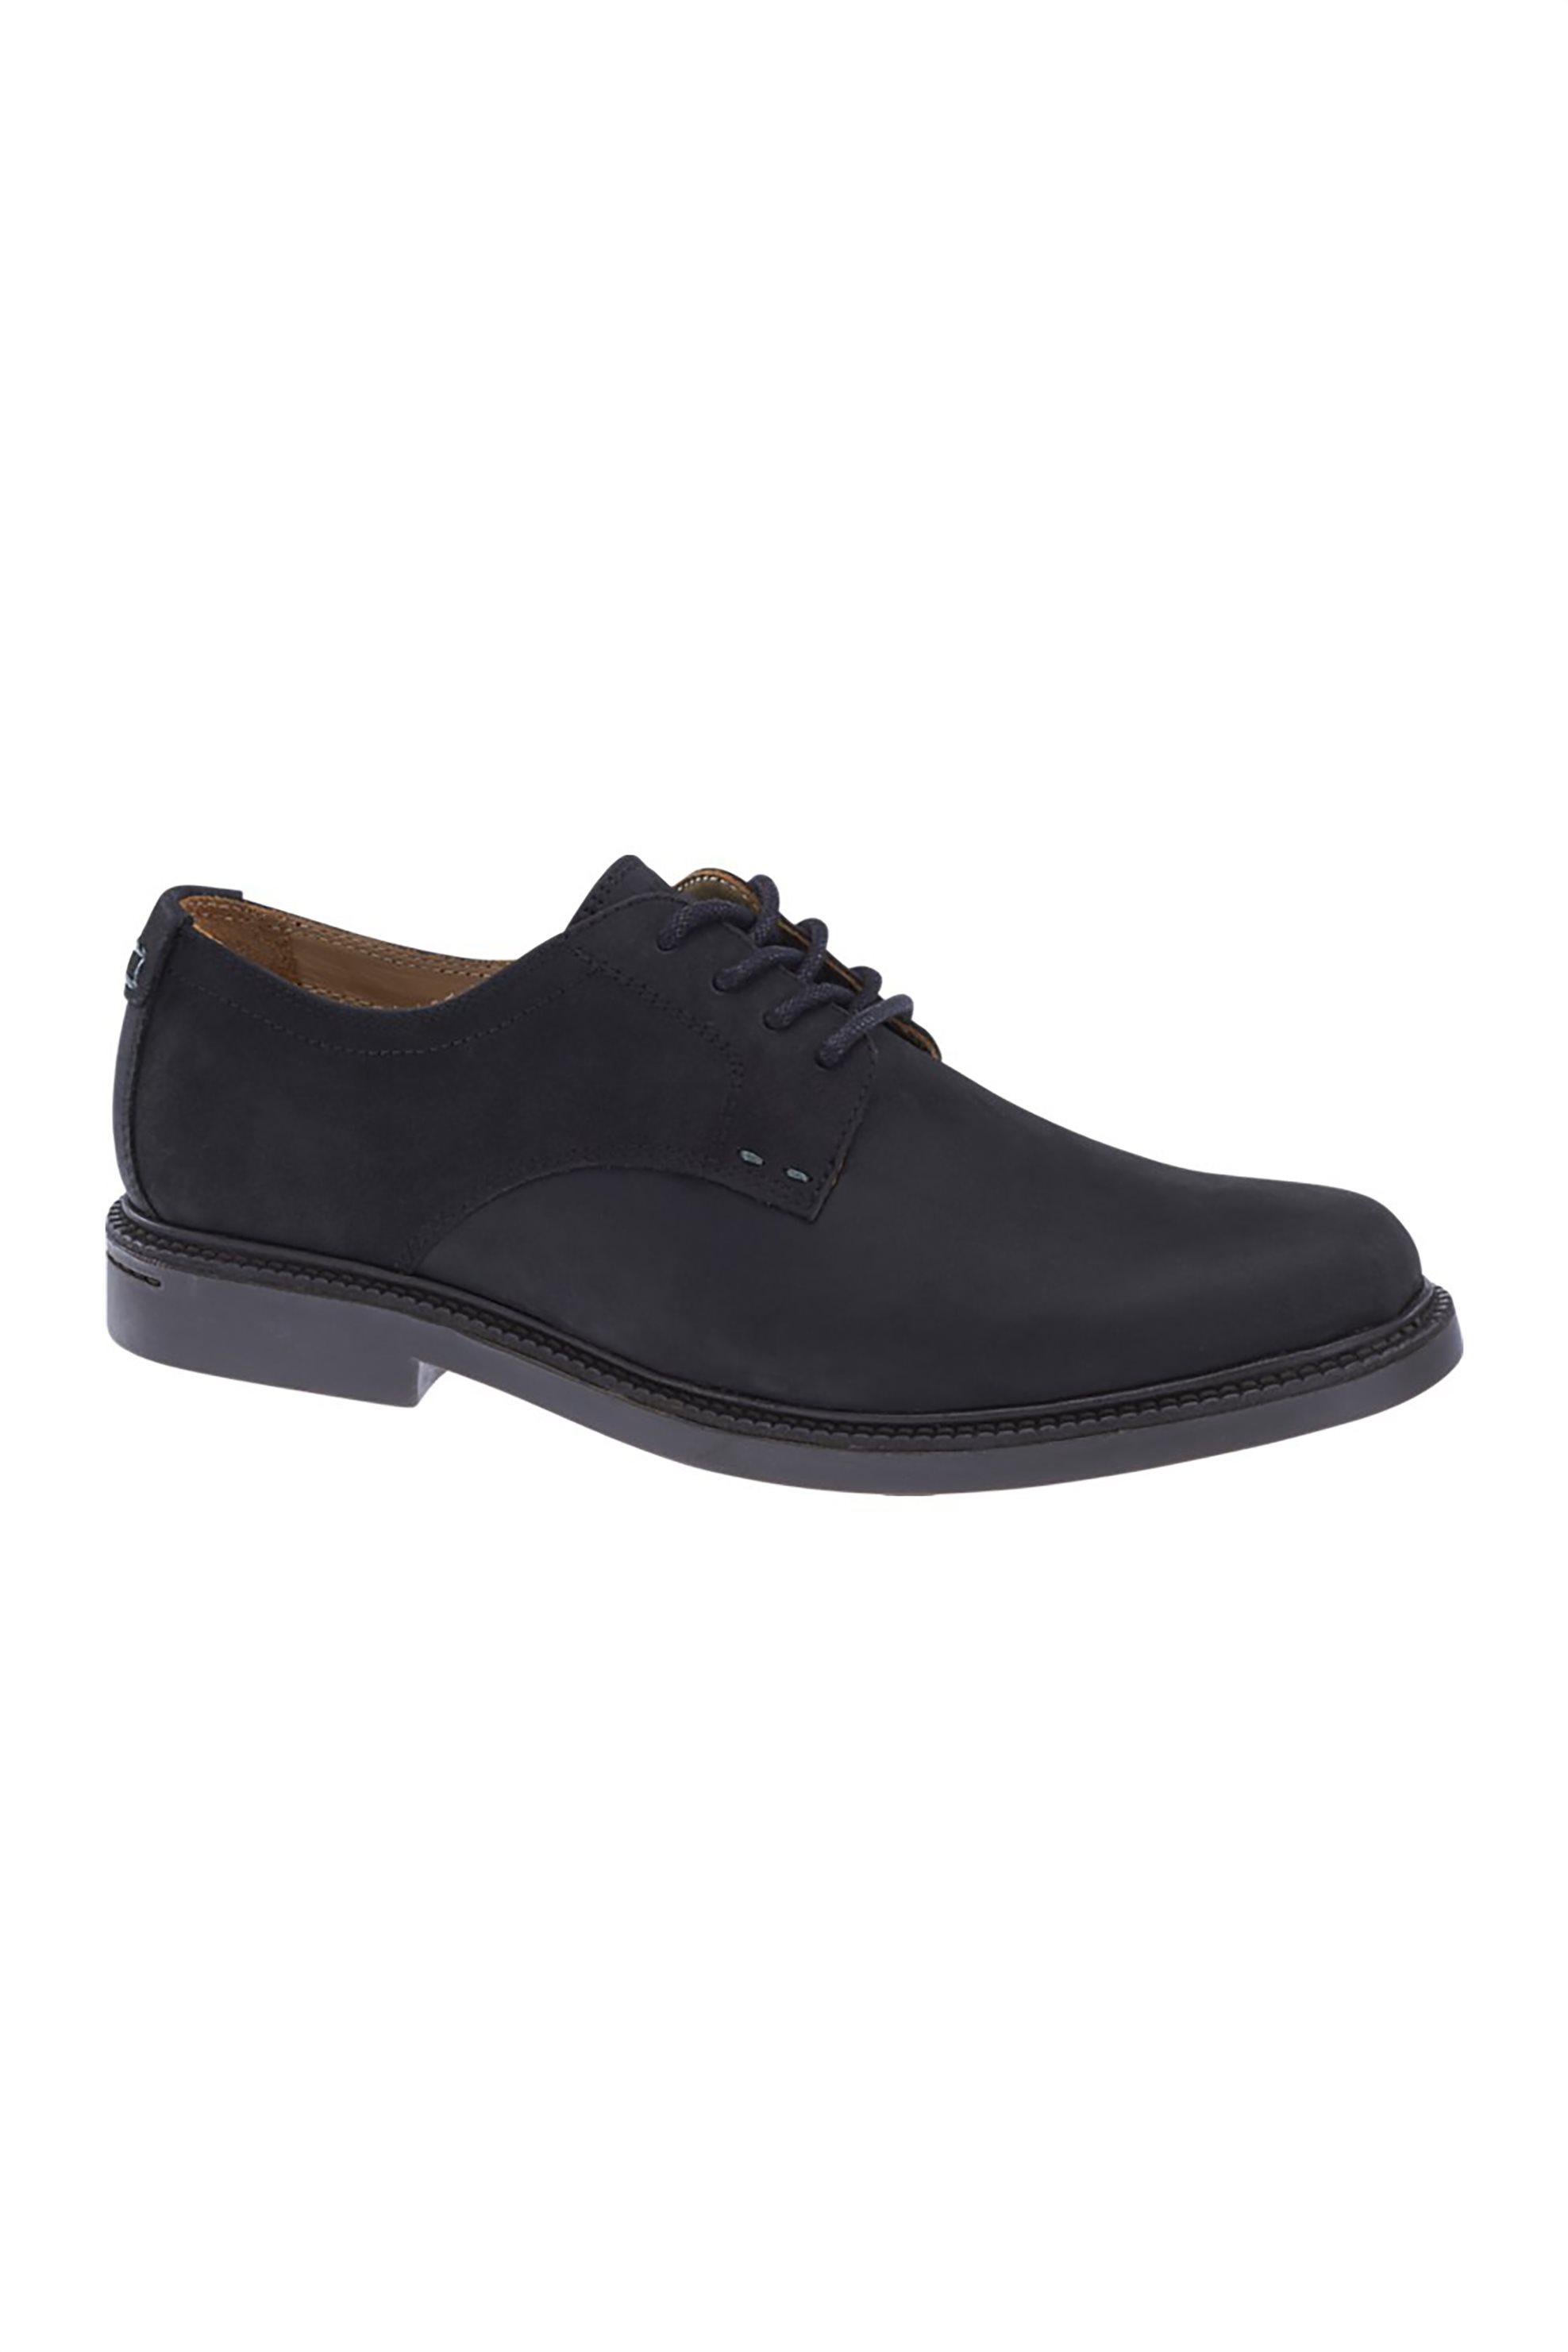 Notos Sebago ανδρικά παπούτσια δερμάτινα Turner Lace Up – B810260 – Μαύρο 76e3fd6bc9d